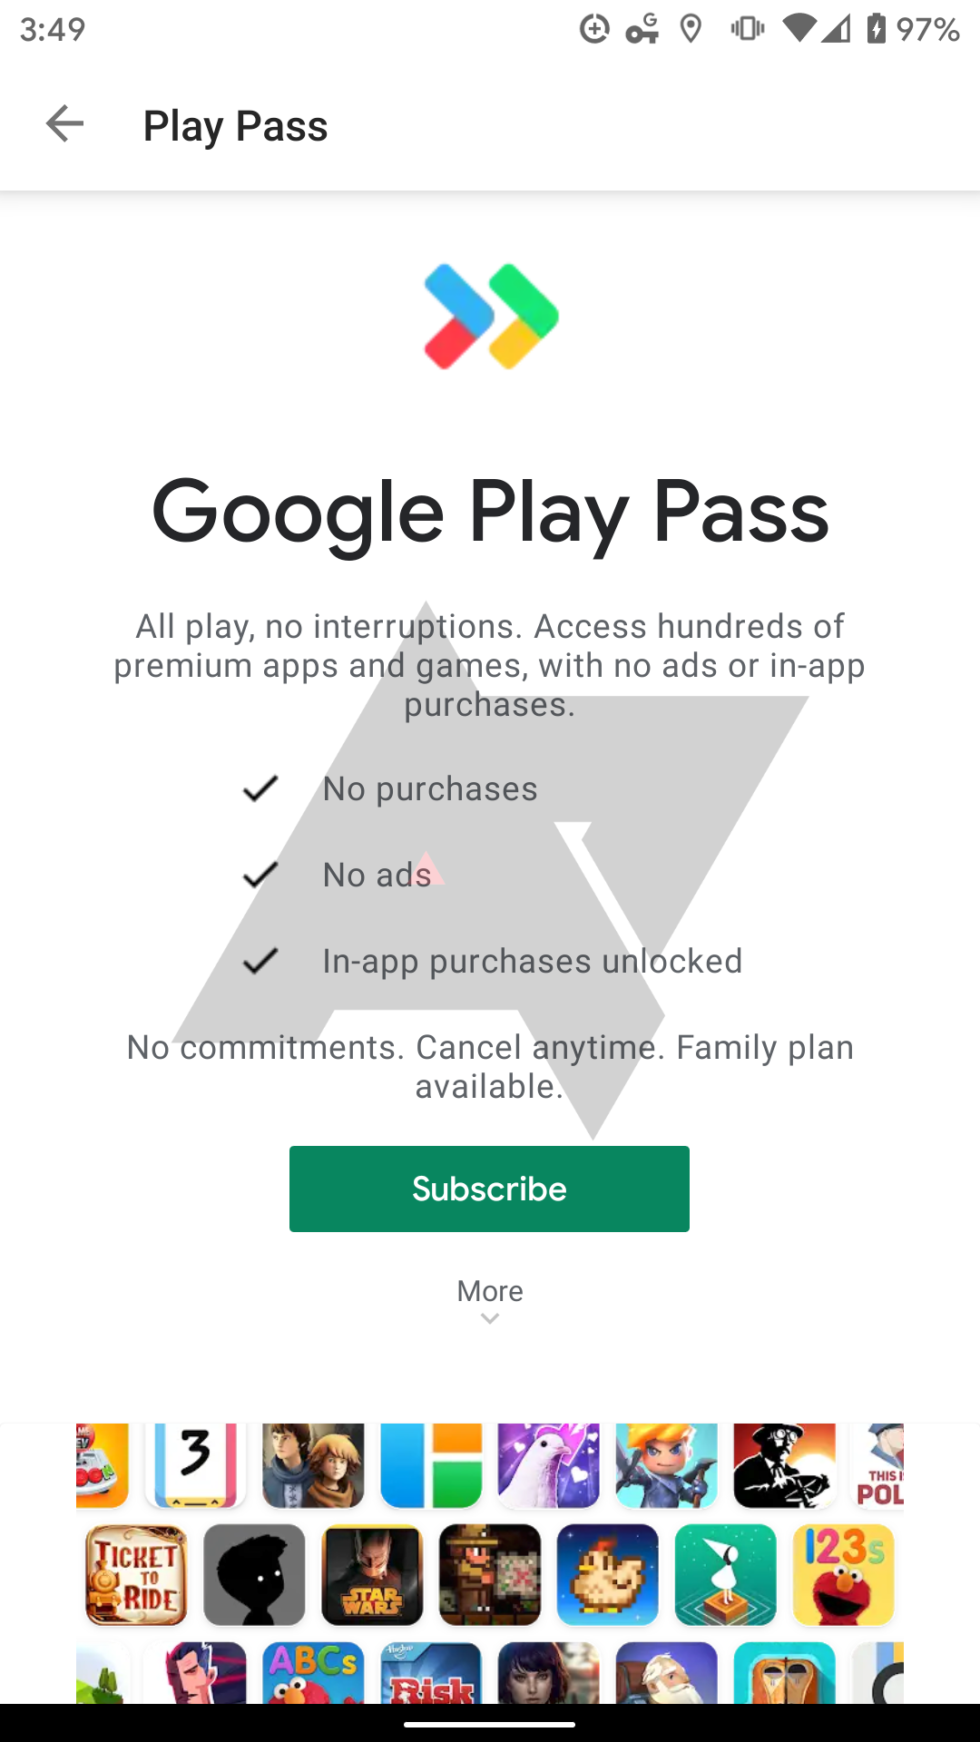 google-play-pass-screenshot-5-980x1742.p